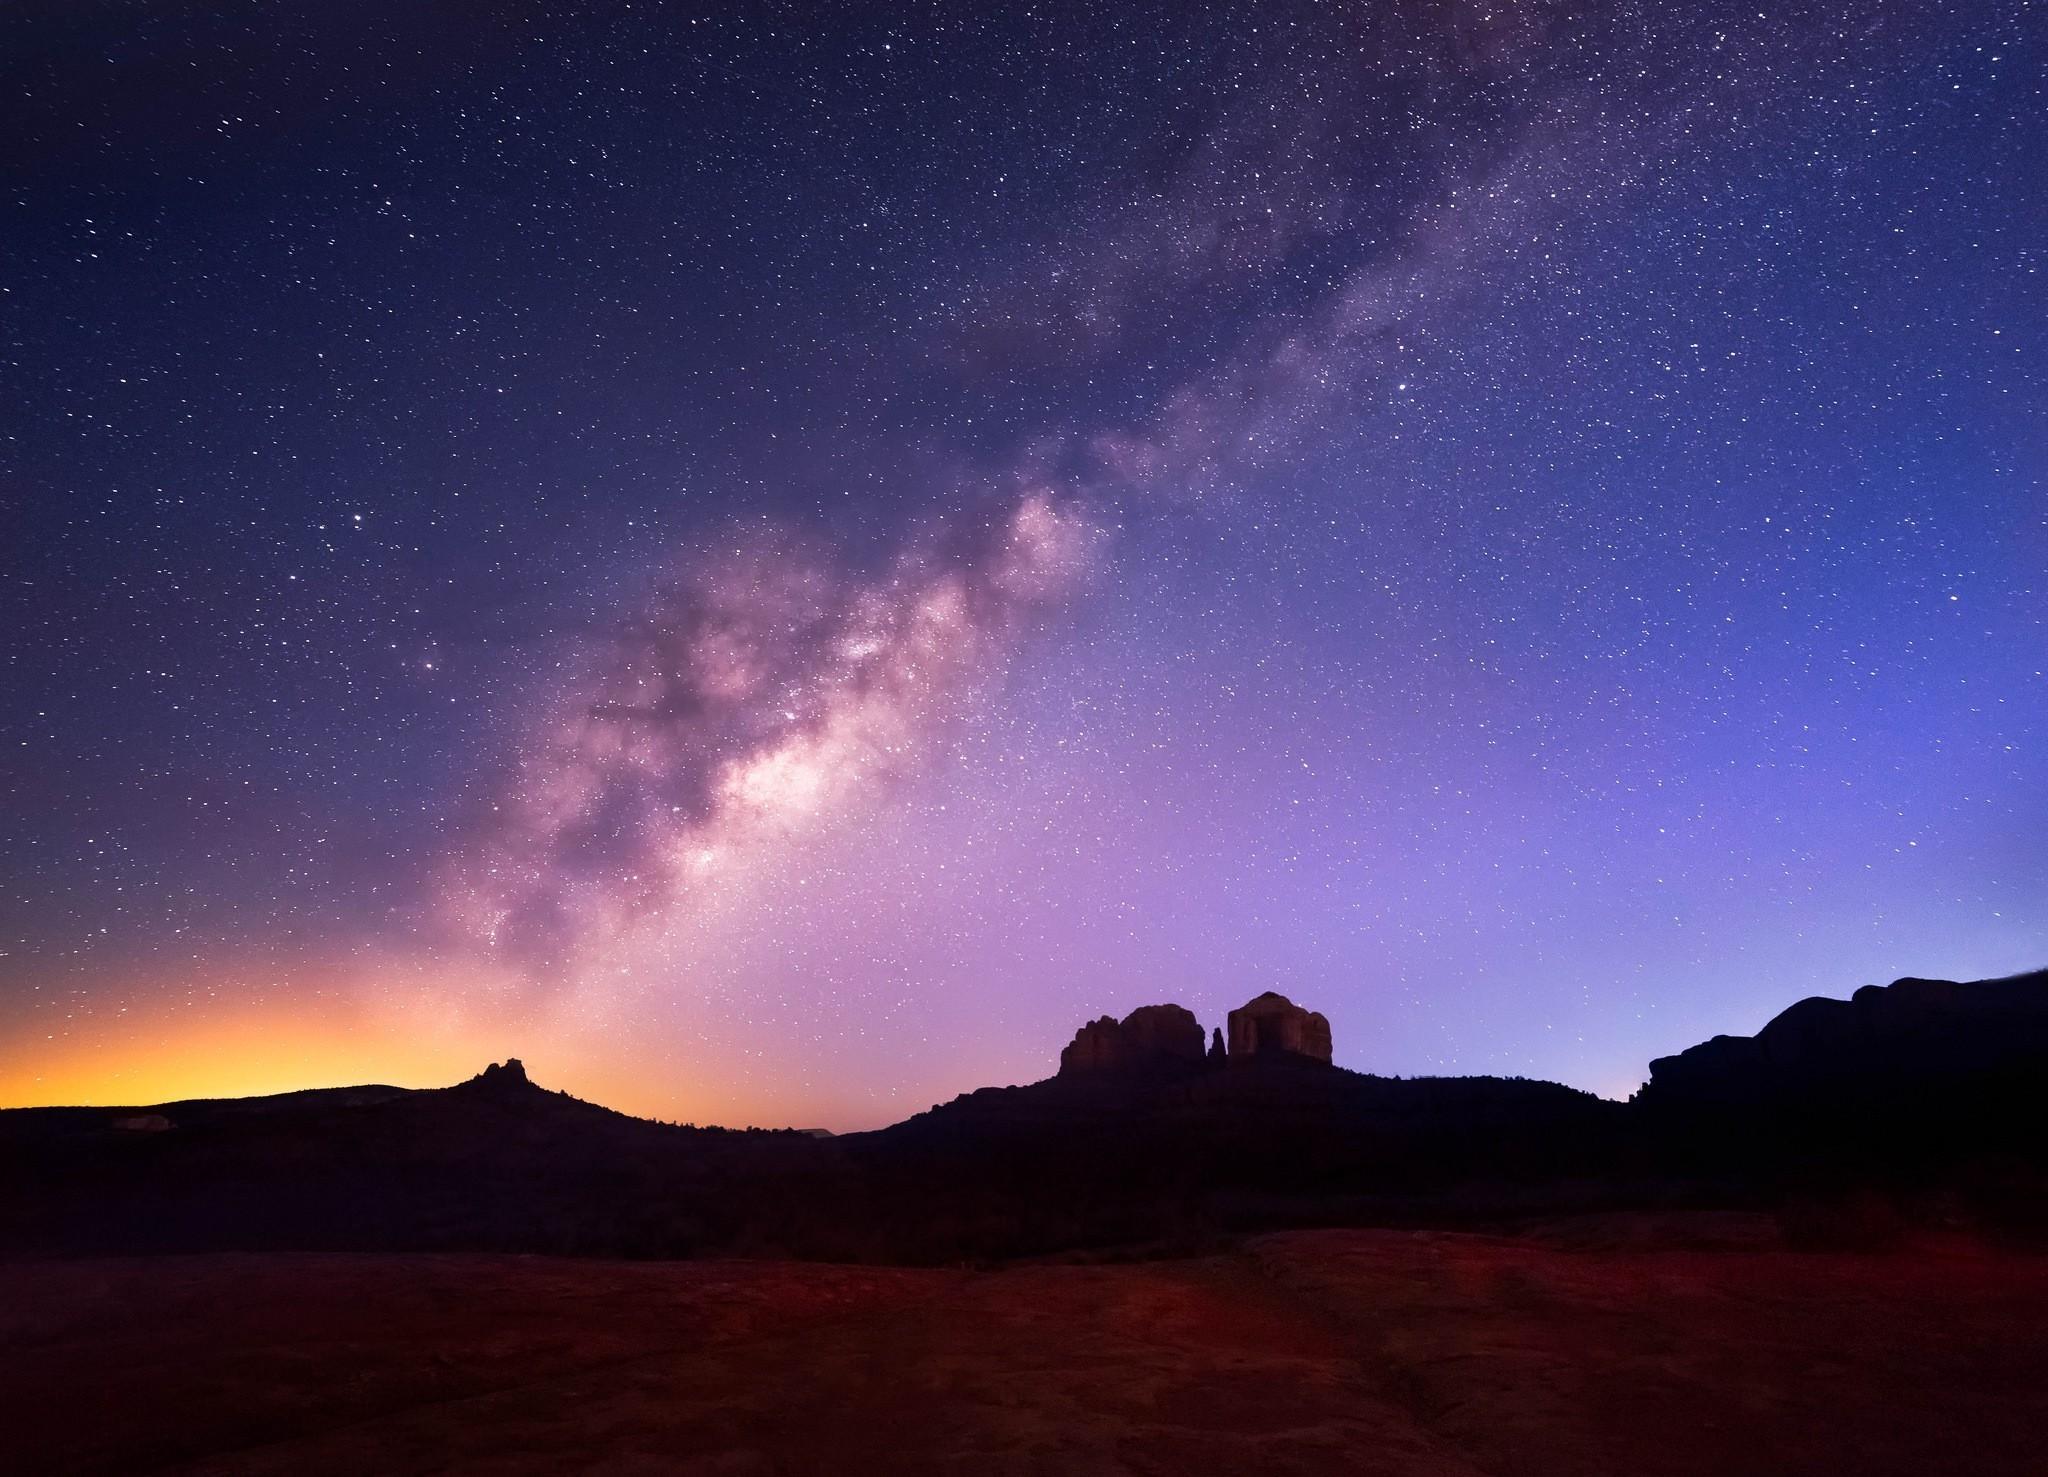 Space Universe Stars Milky Way Wallpapers Hd Desktop